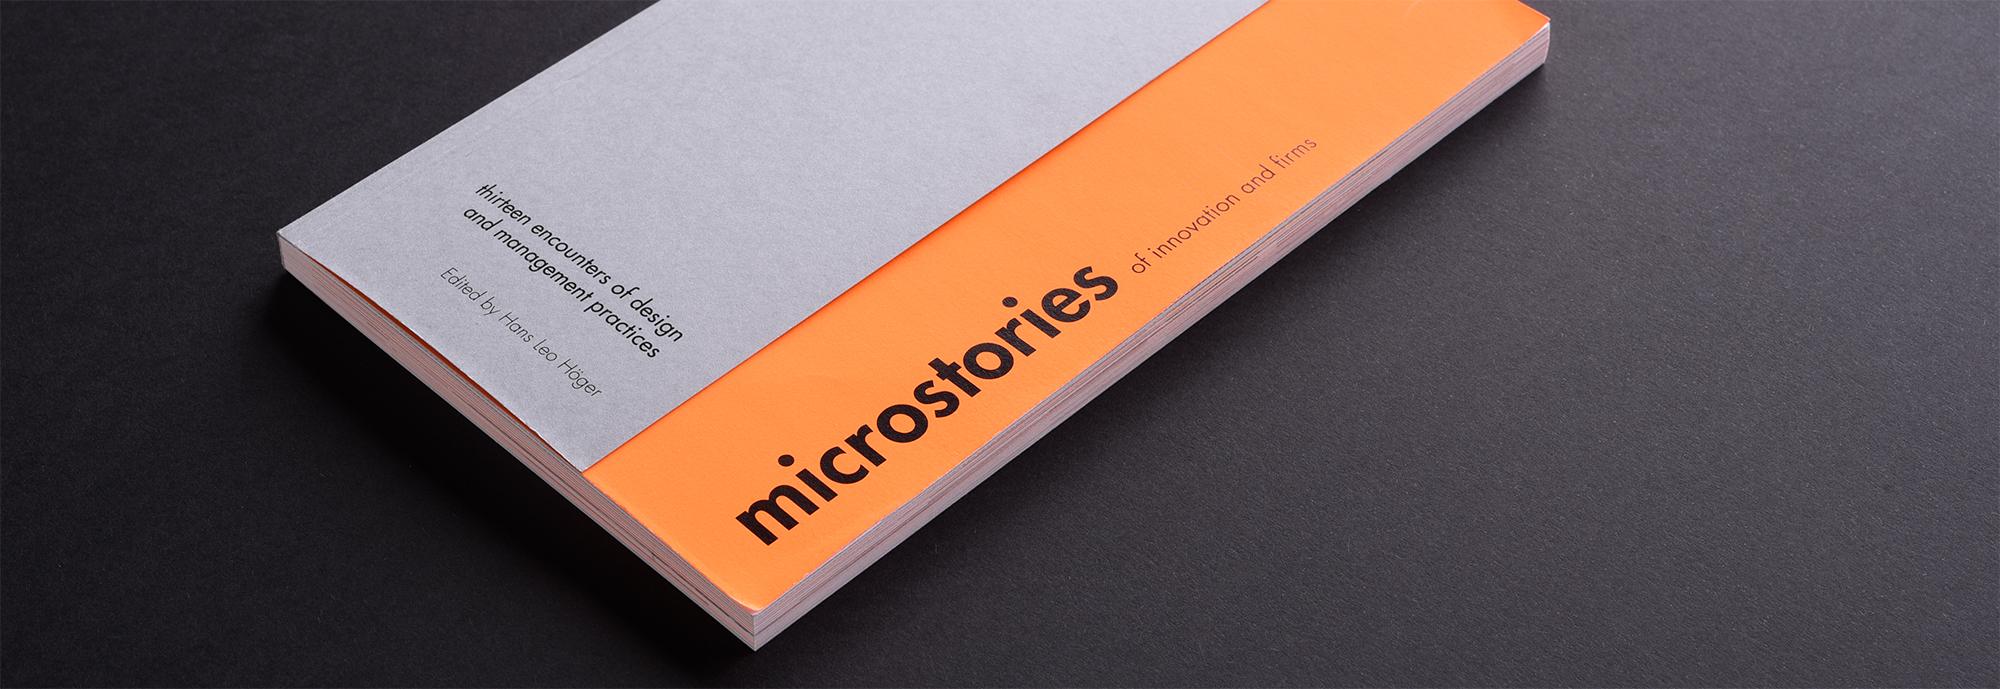 fattidistorie_microstorie_1